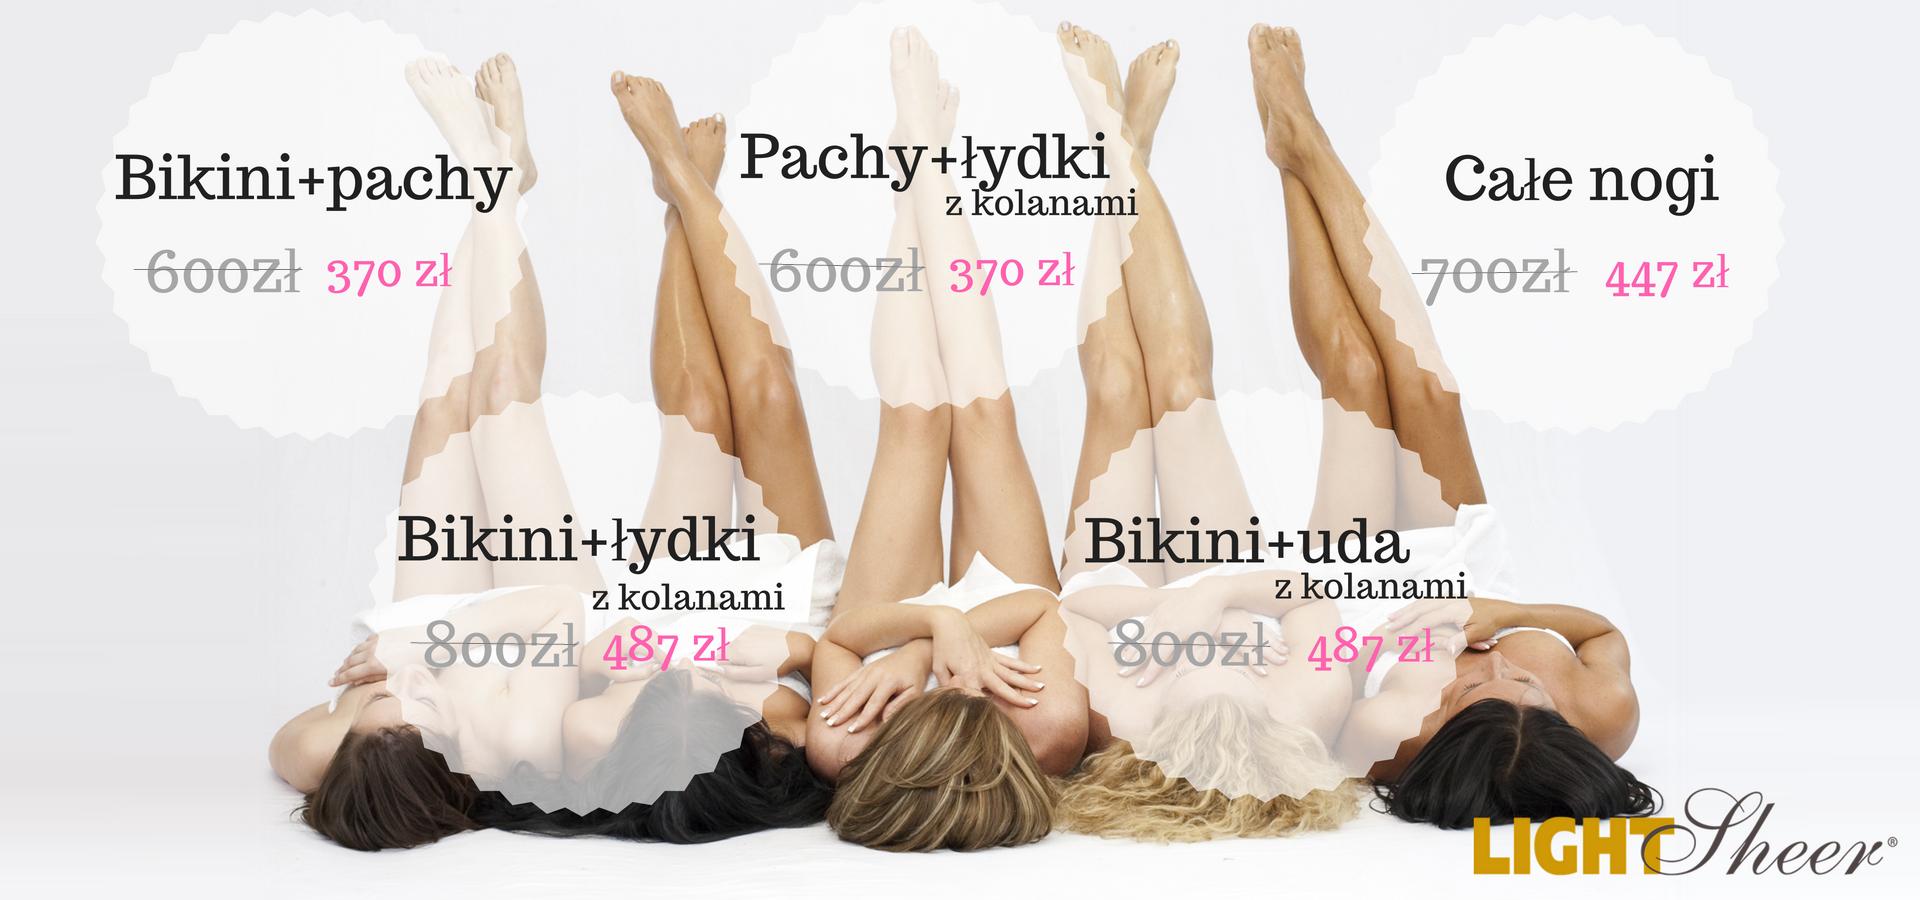 Bikini+pachy1